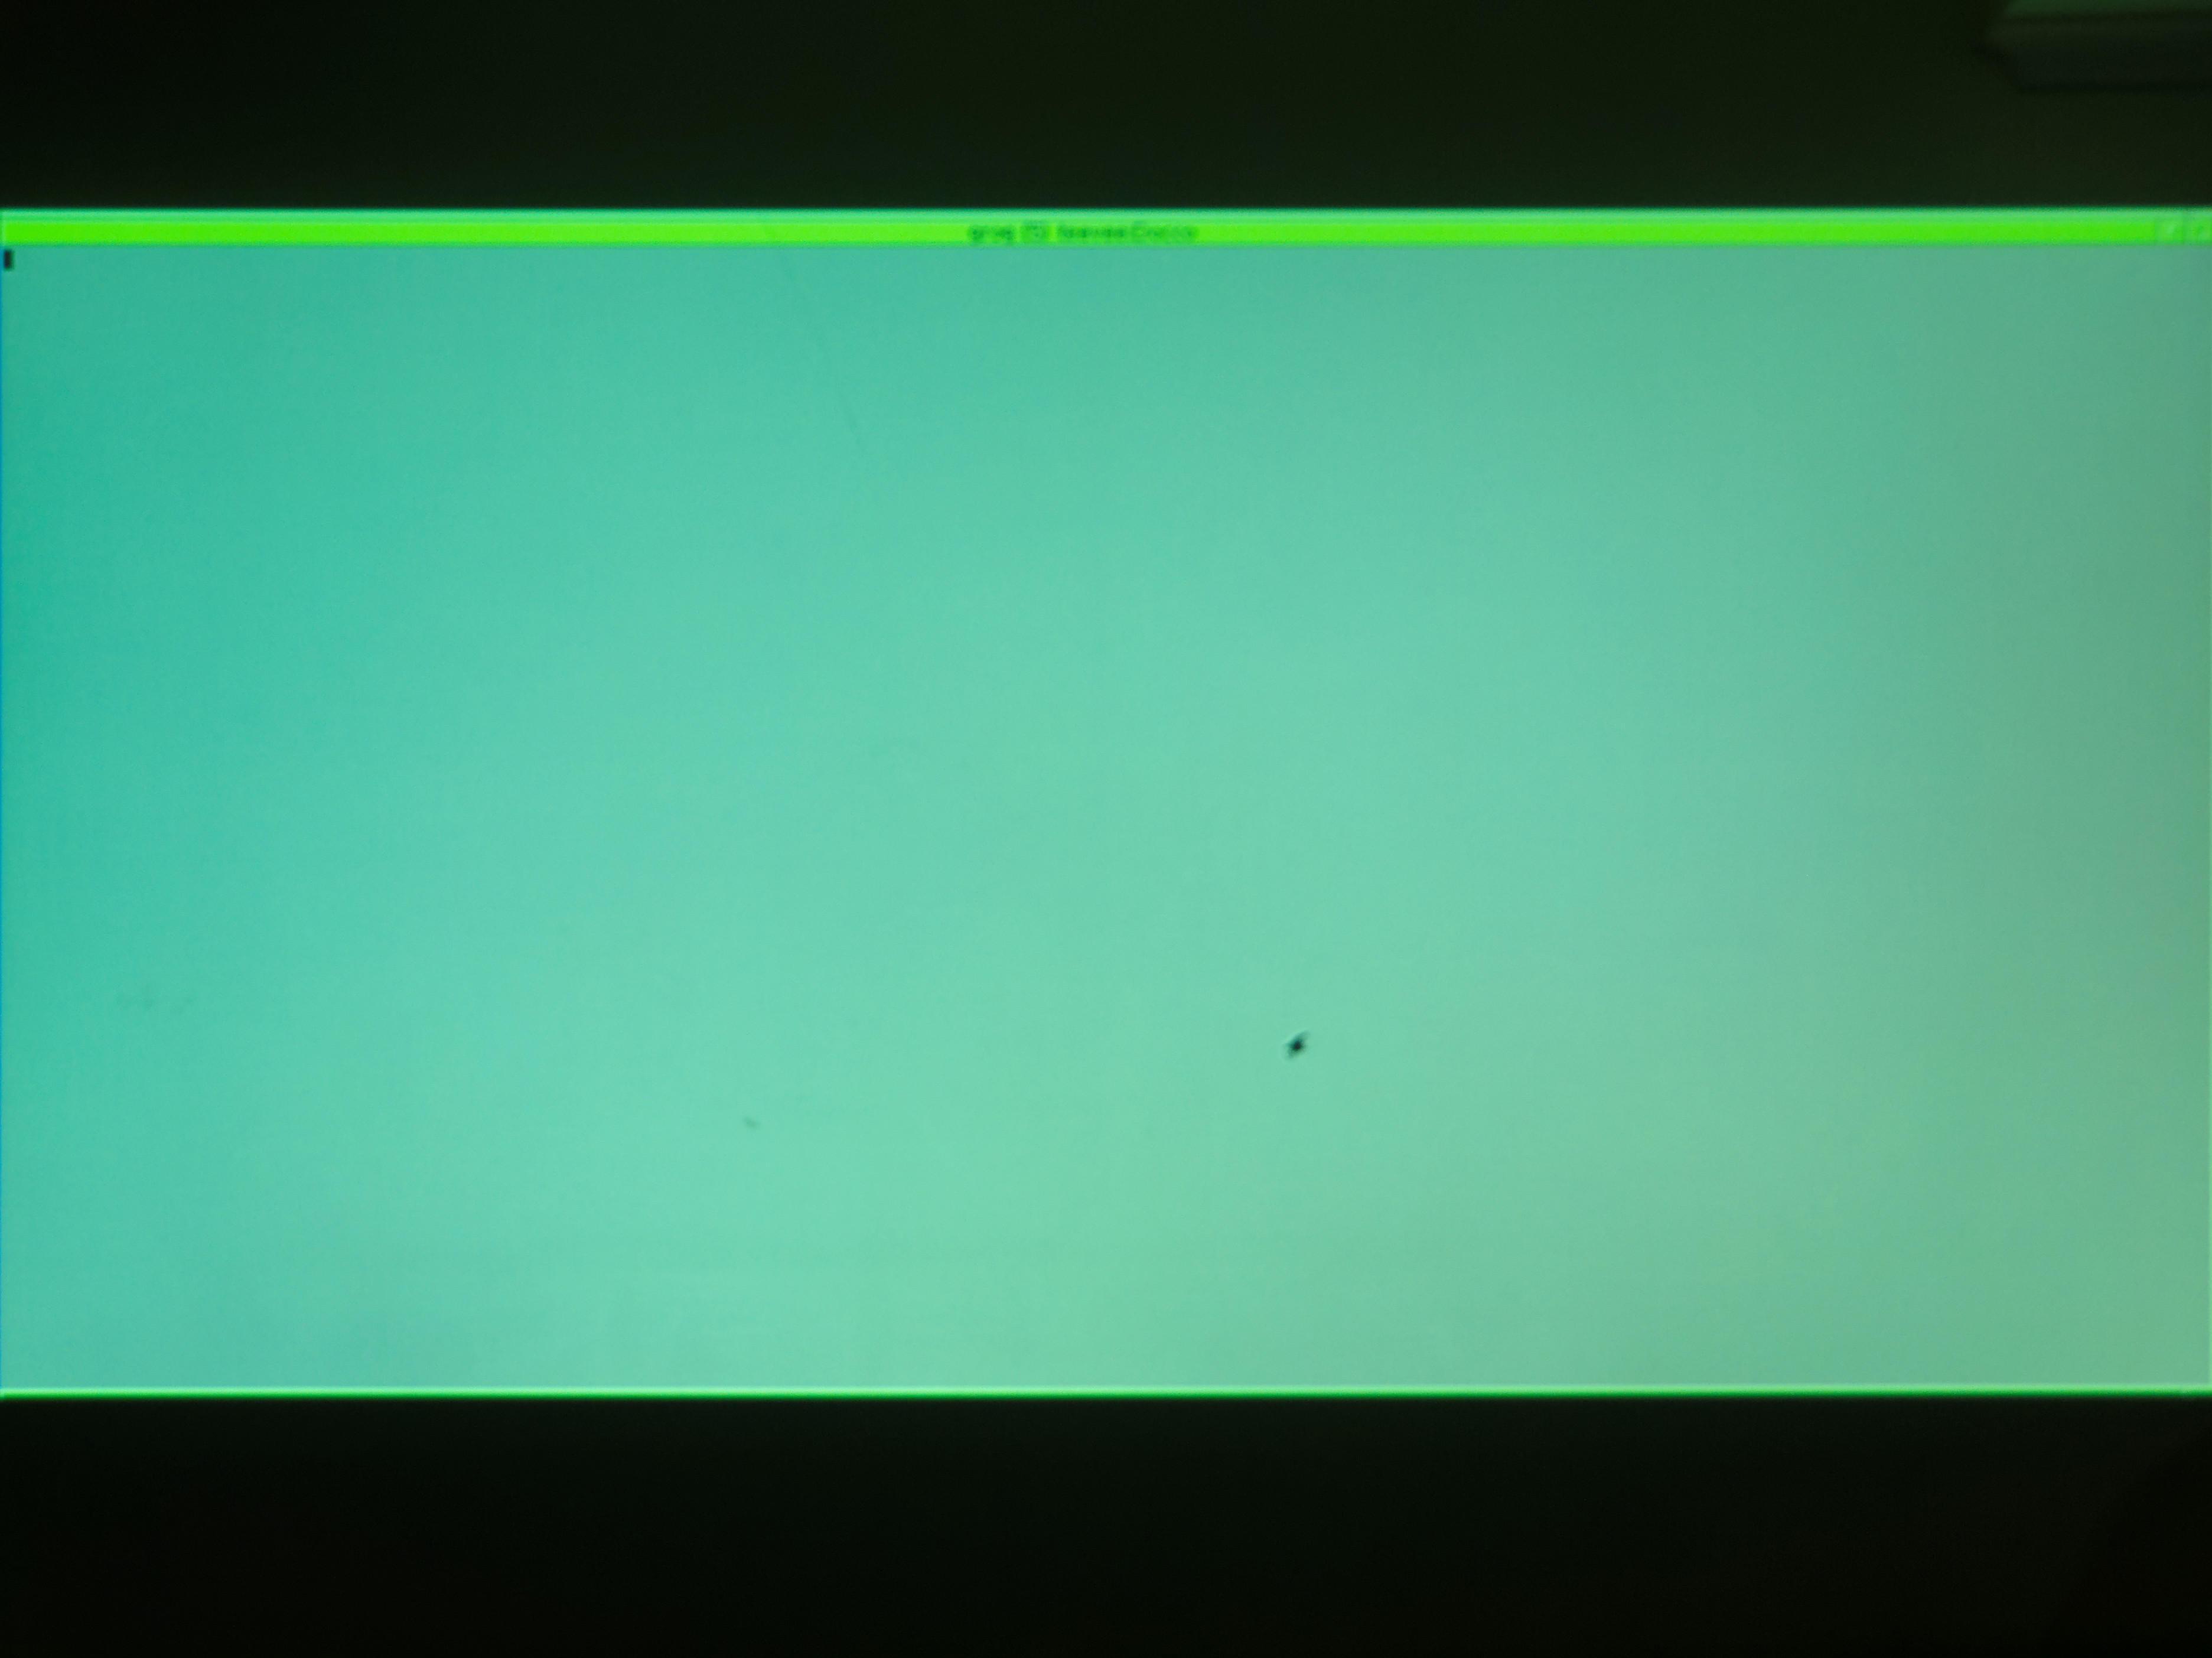 Screen-1.jpeg